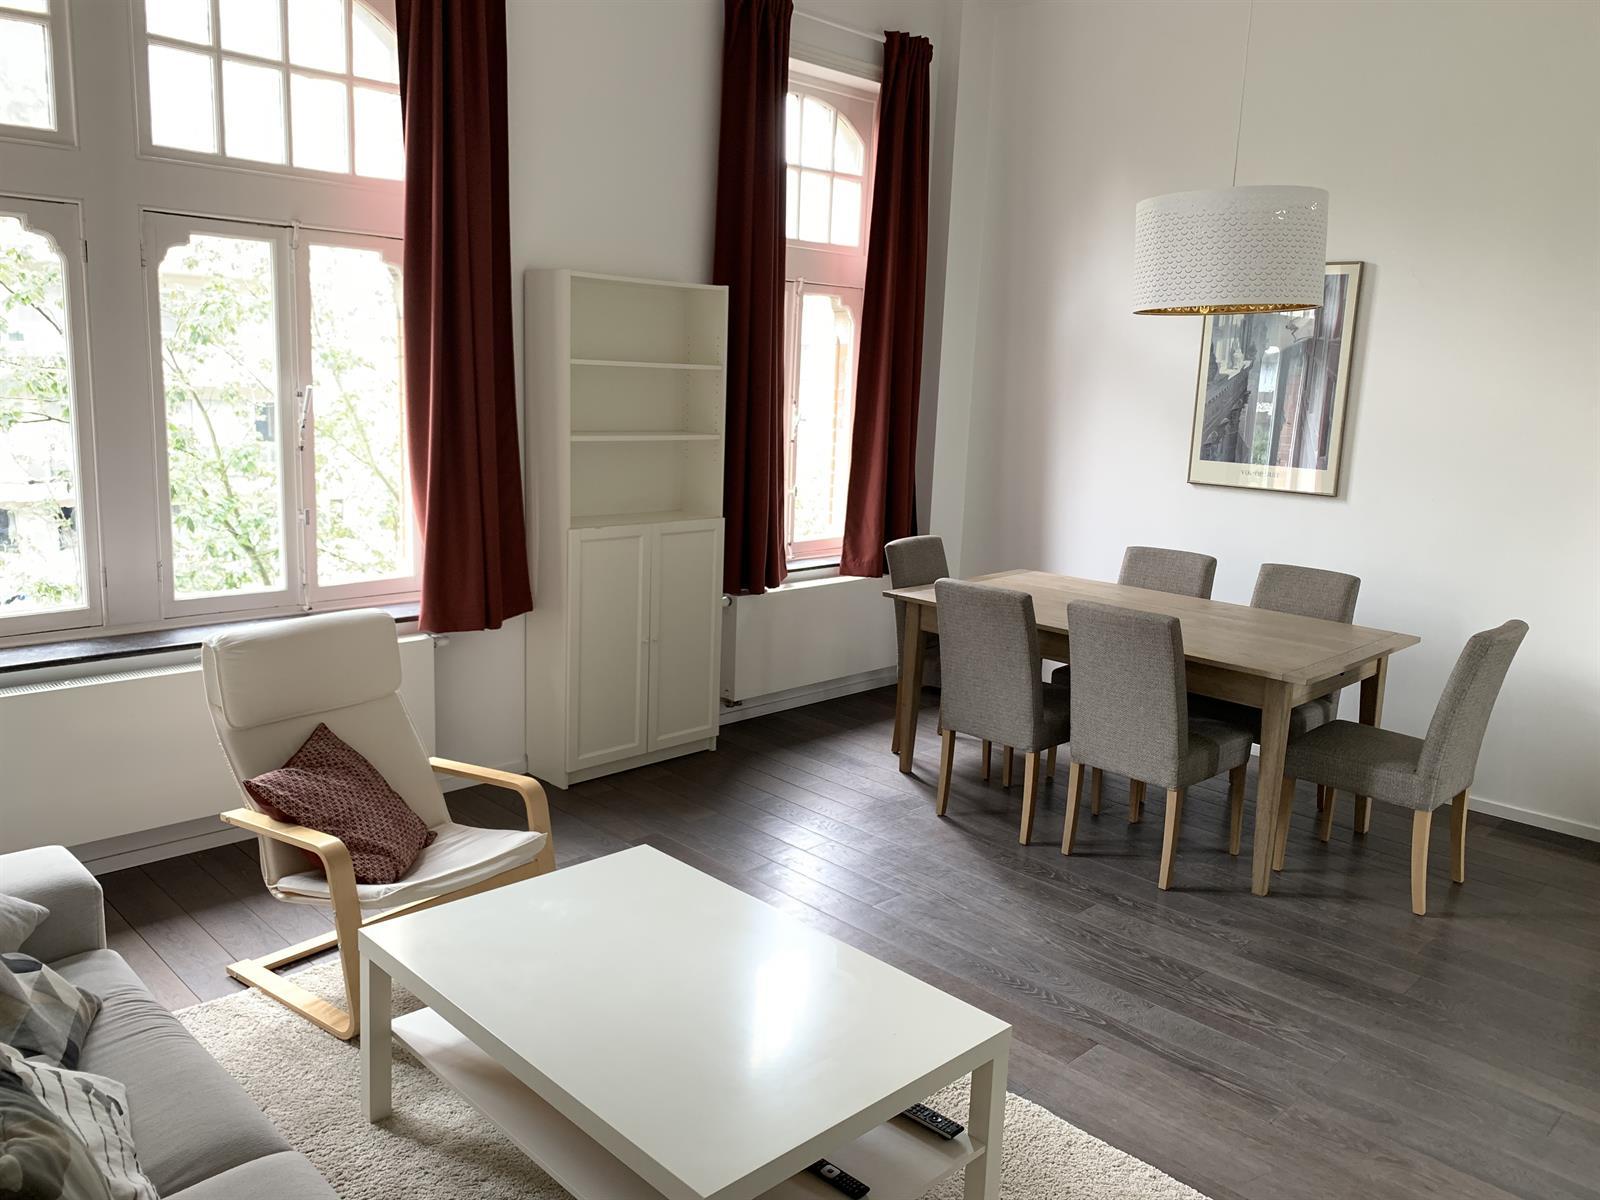 Duplex - Etterbeek - #4102292-1